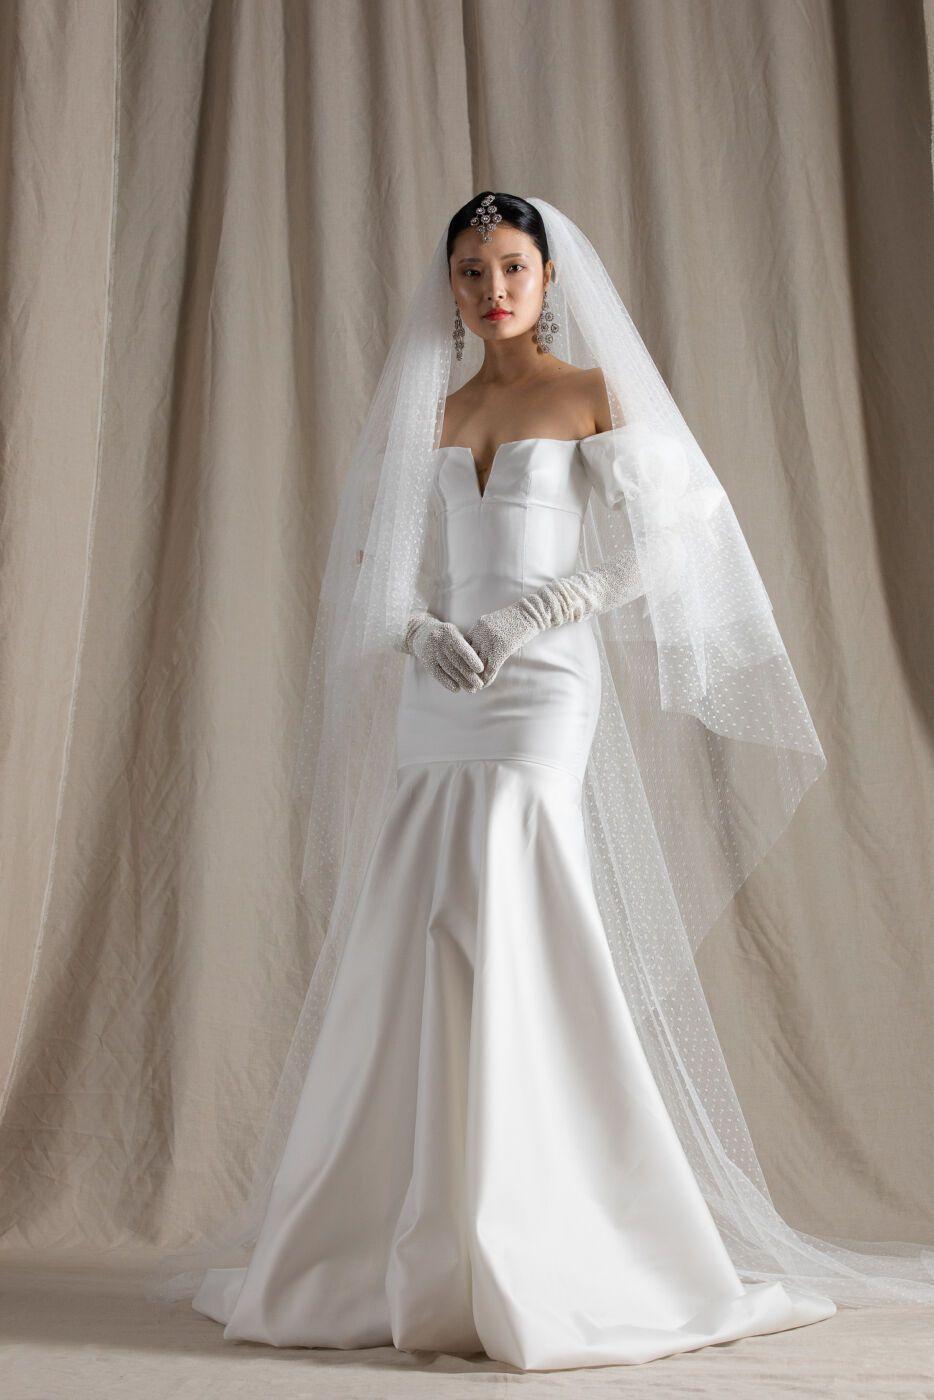 https://www.weddingmagazine.com.ua/wp-content/uploads/2021/04/naeem-khan-bridal-spring-2022-10.jpg